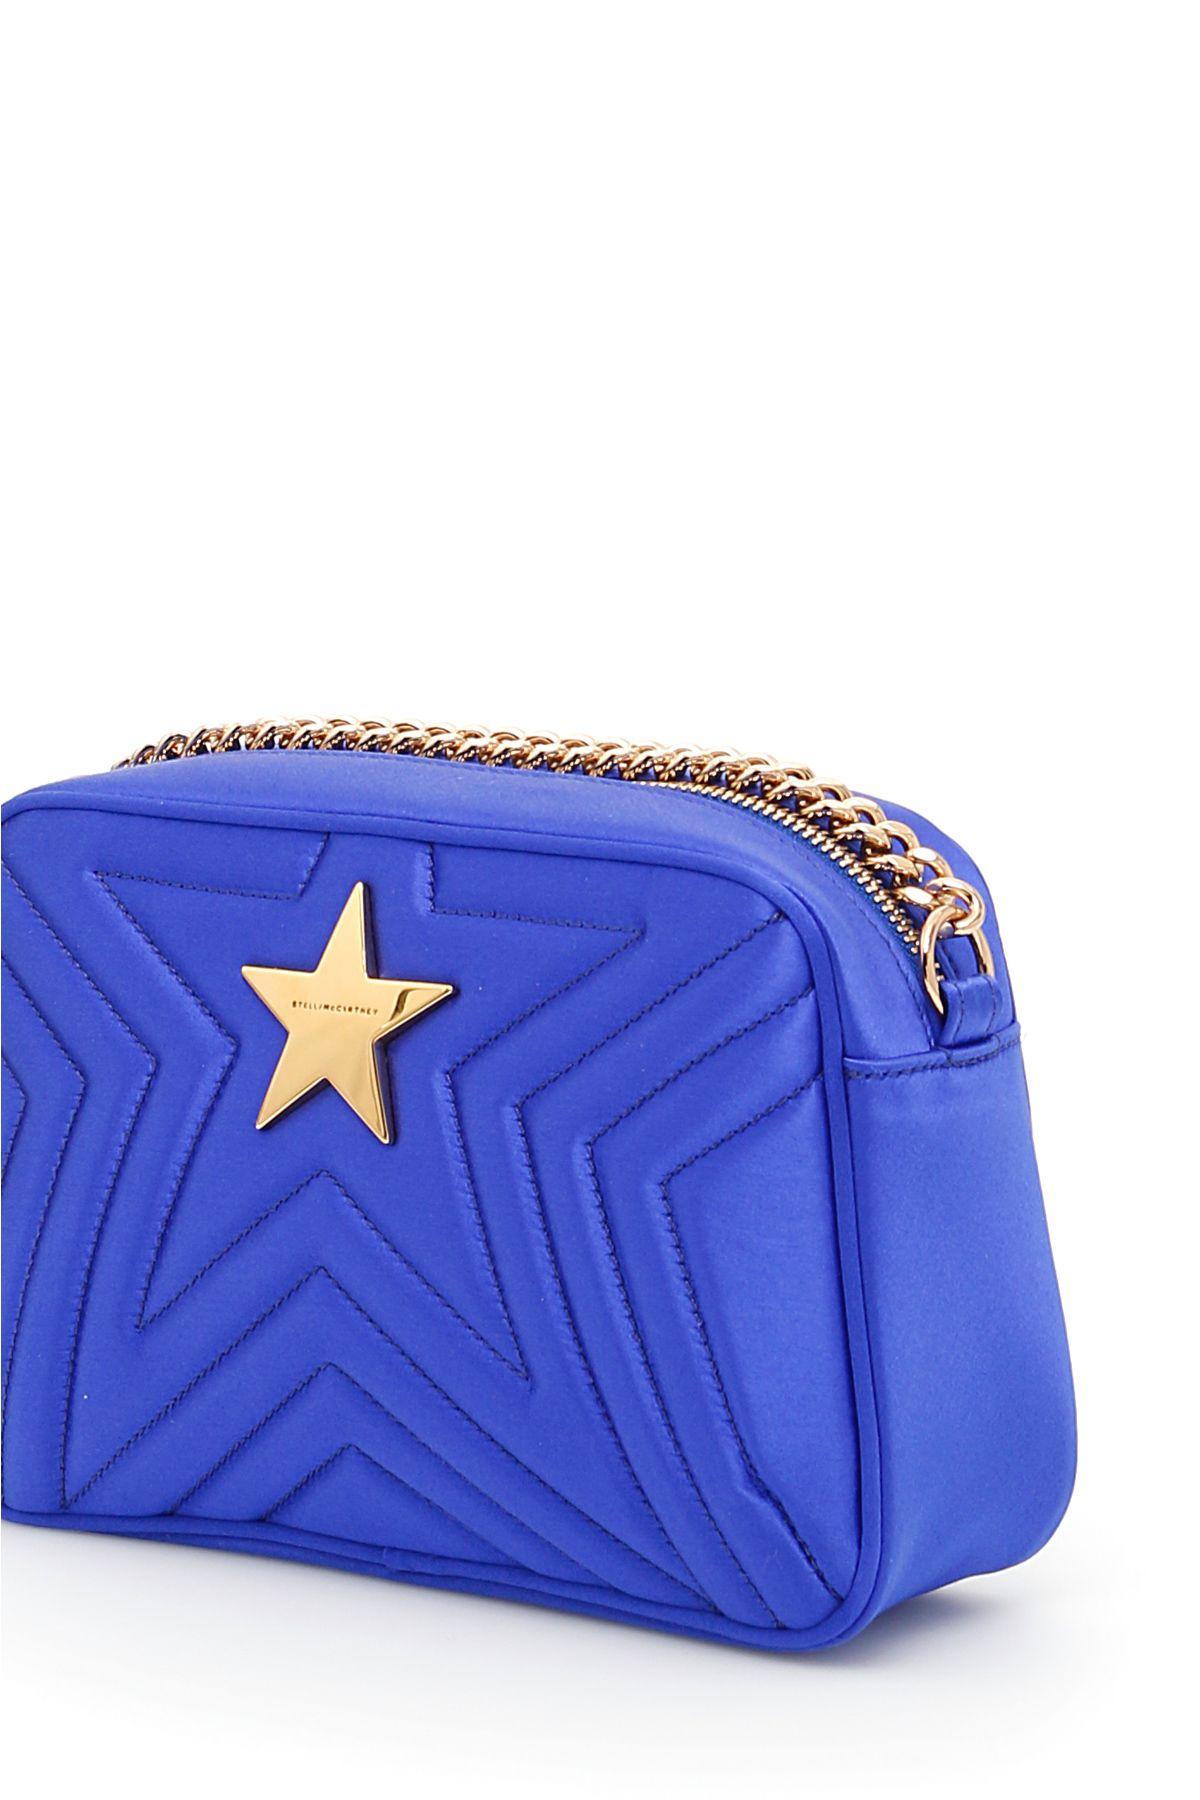 5ac11fbcca3d Stella McCartney Stella McCartney Quilted Satin Stella Star Bag ...